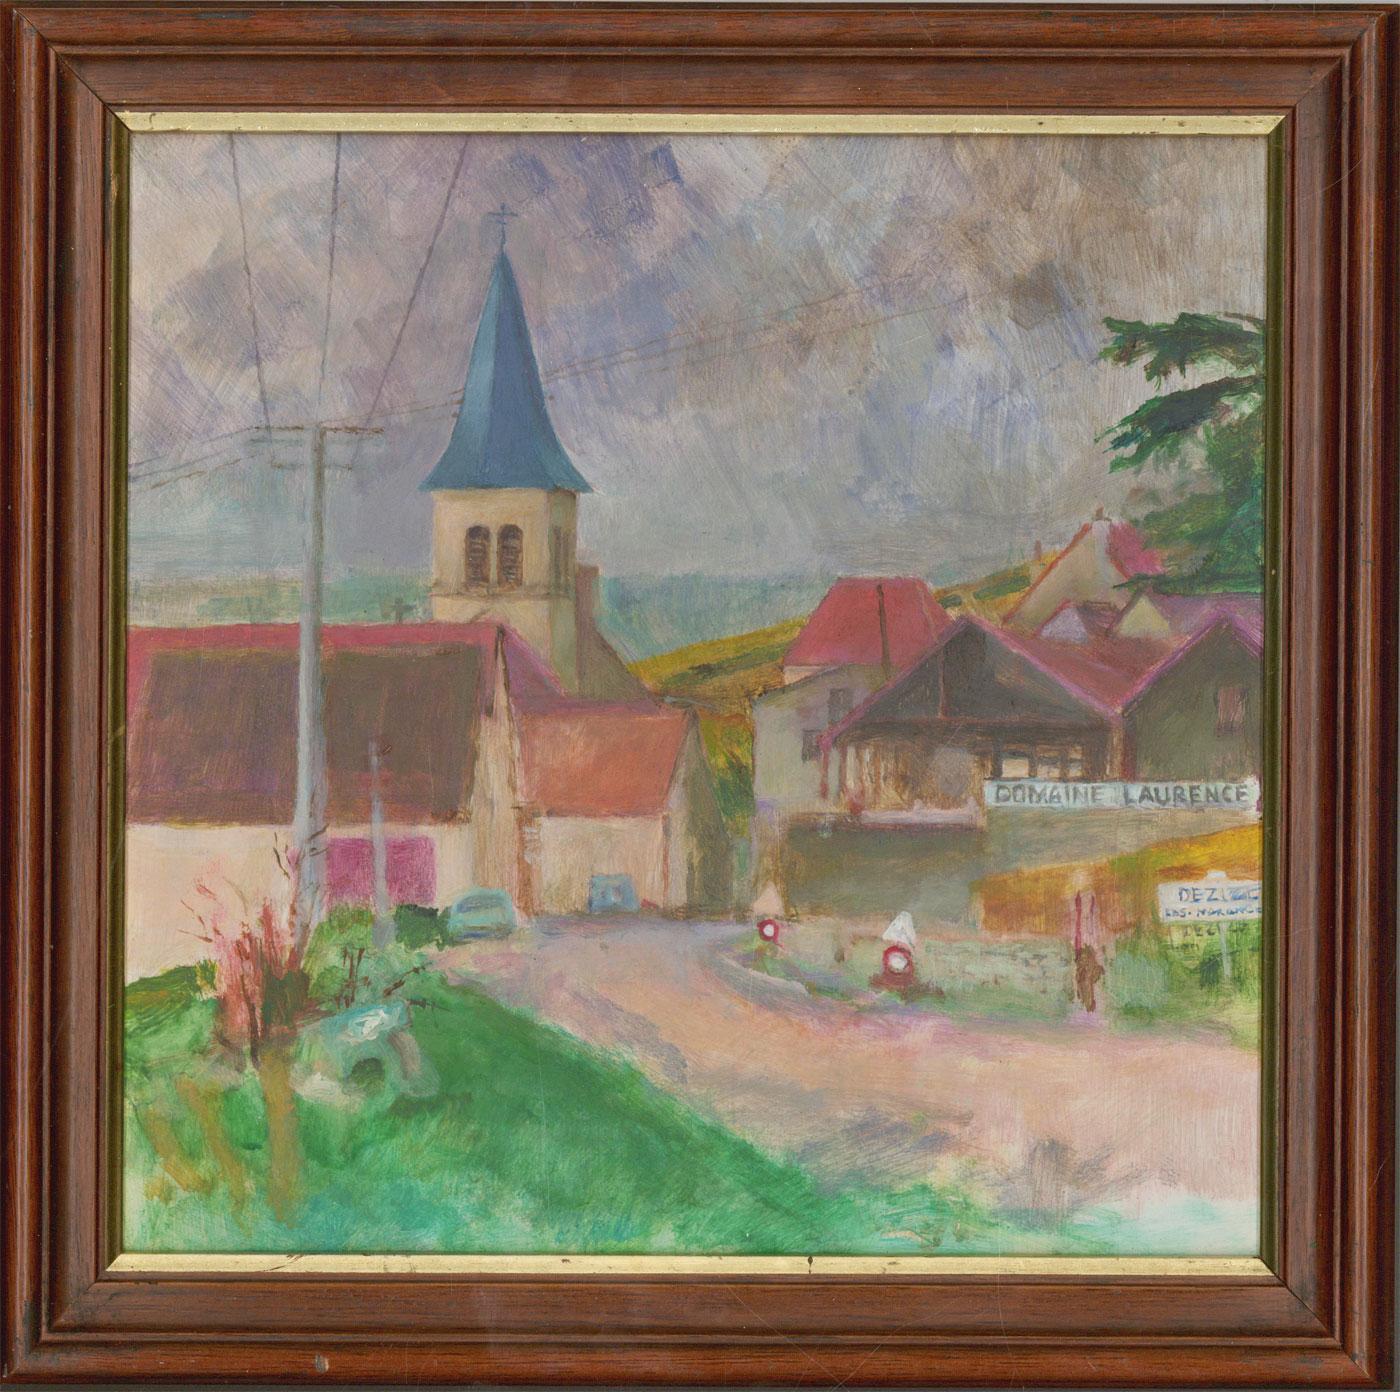 John Ivor Stewart PPPS (1936-2018) - Contemporary Oil, Domaine Laurence, France